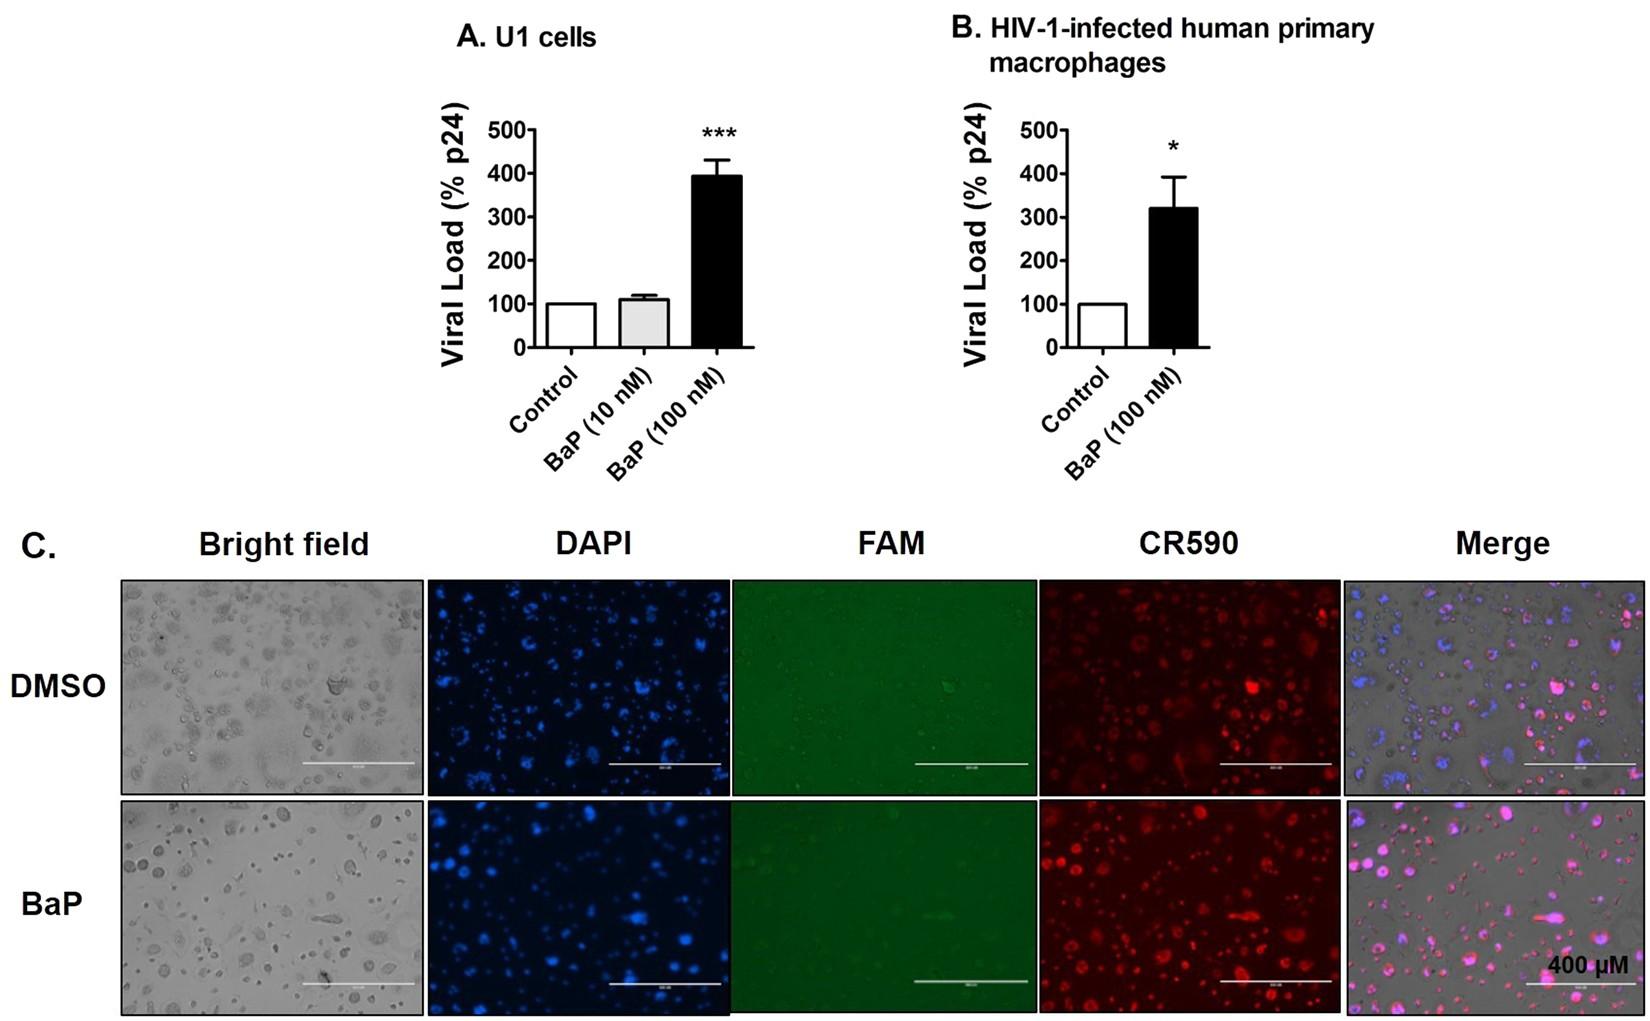 Benzo(a)pyrene in Cigarette Smoke Enhances HIV-1 Replication